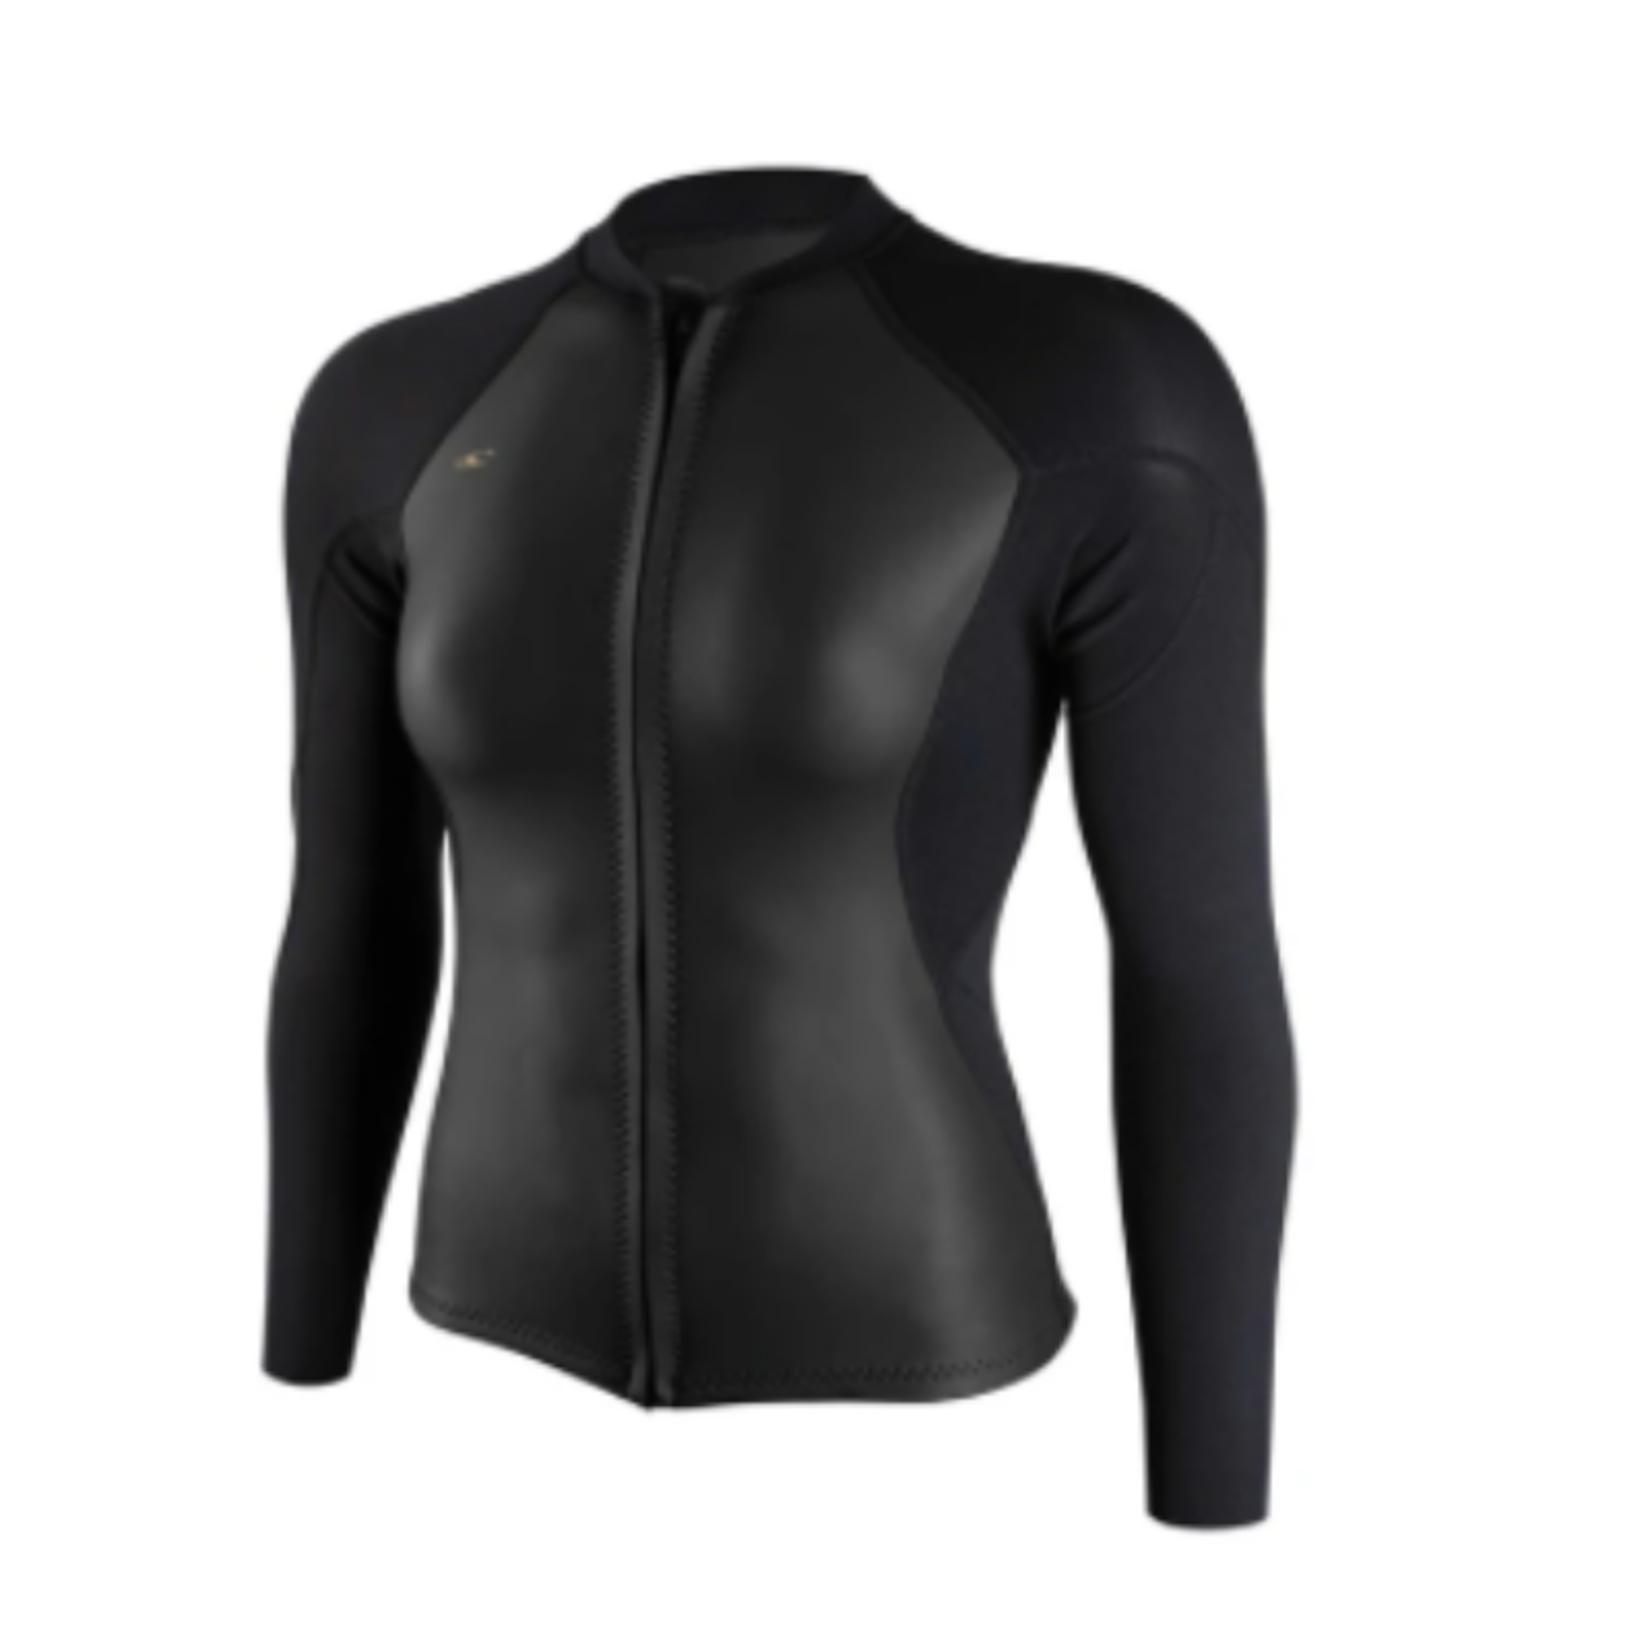 O'Neill O'Neill Women's Bahai 1.5 mm Full Zip Jacket